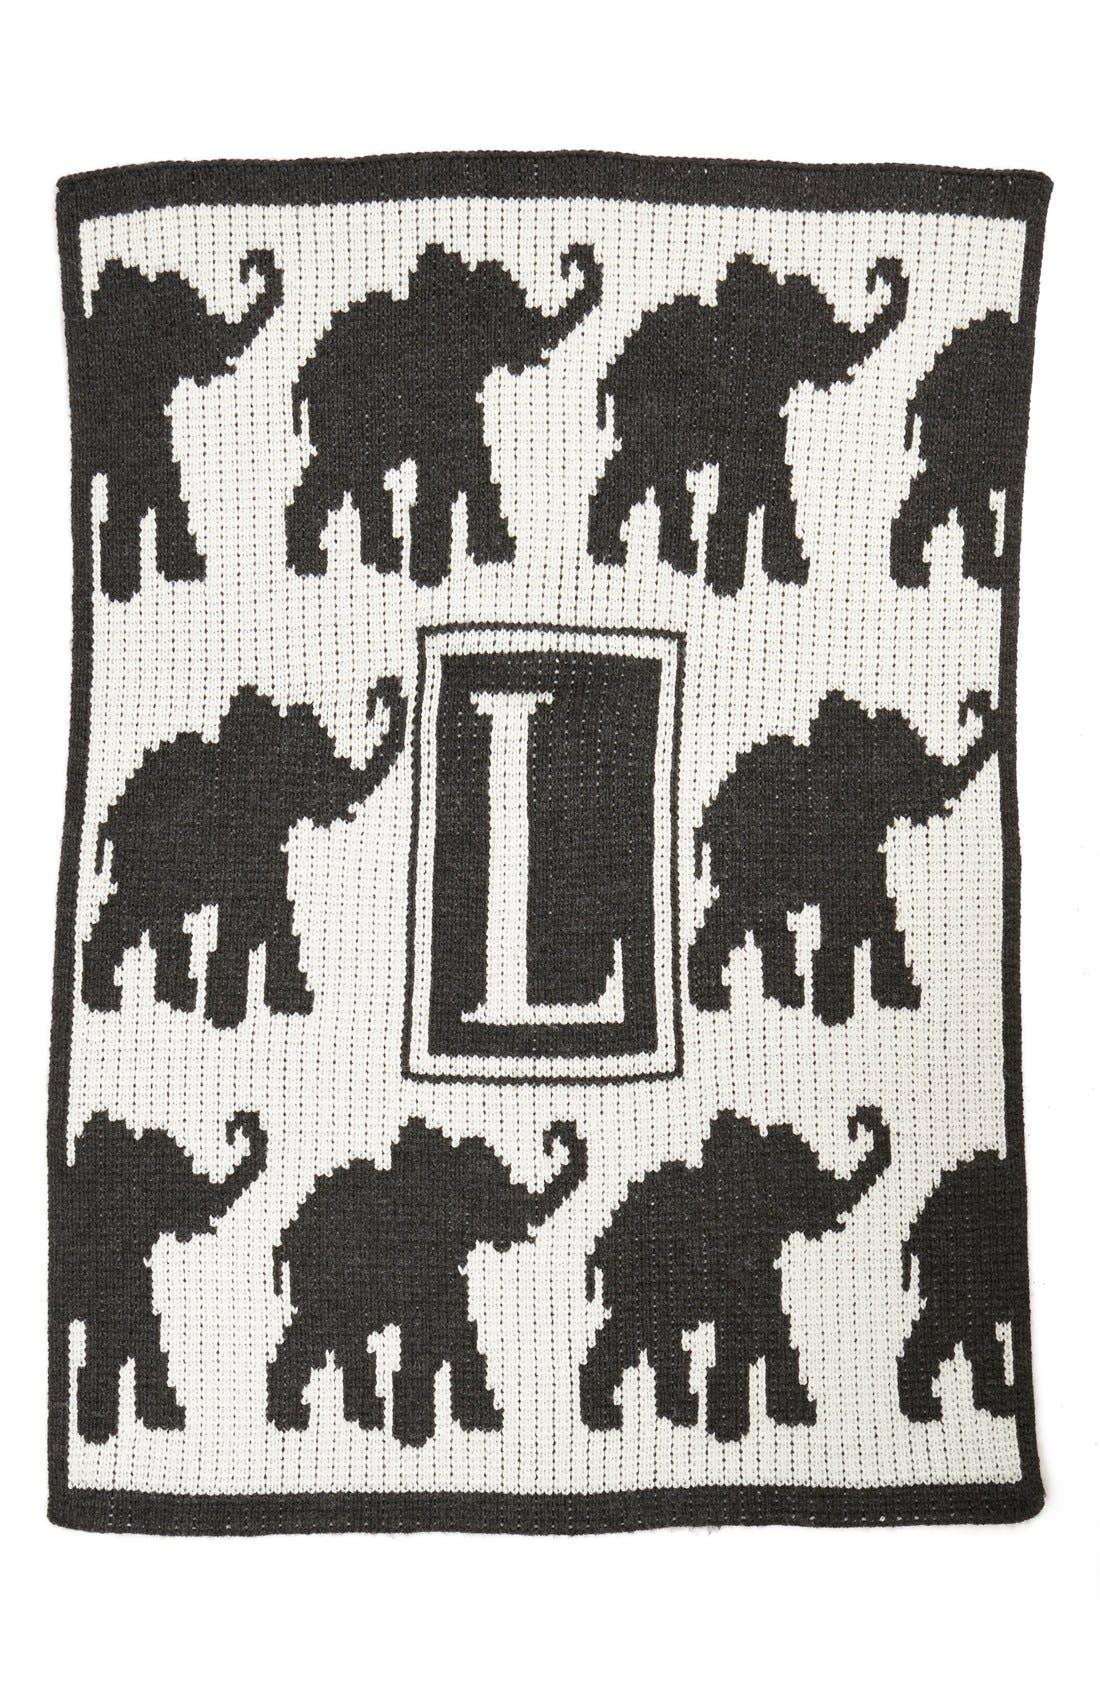 'Walking Elephants' Personalized Crib Blanket,                         Main,                         color, Cream/ Charcoal